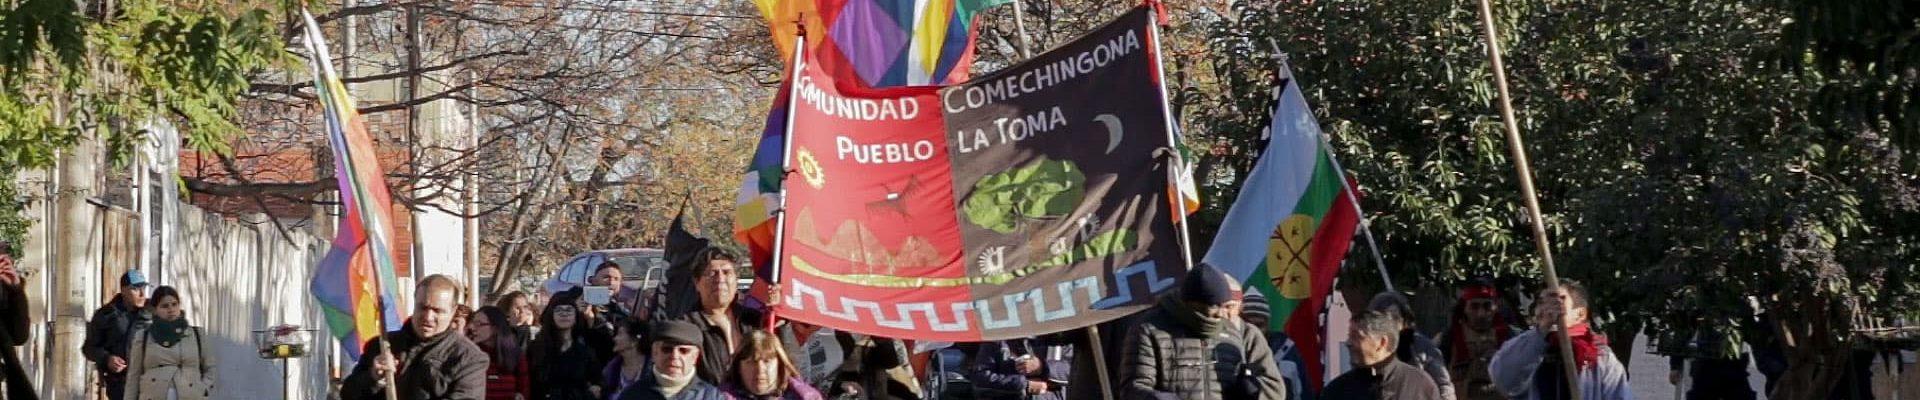 Voces comechingonas en la Córdoba actual